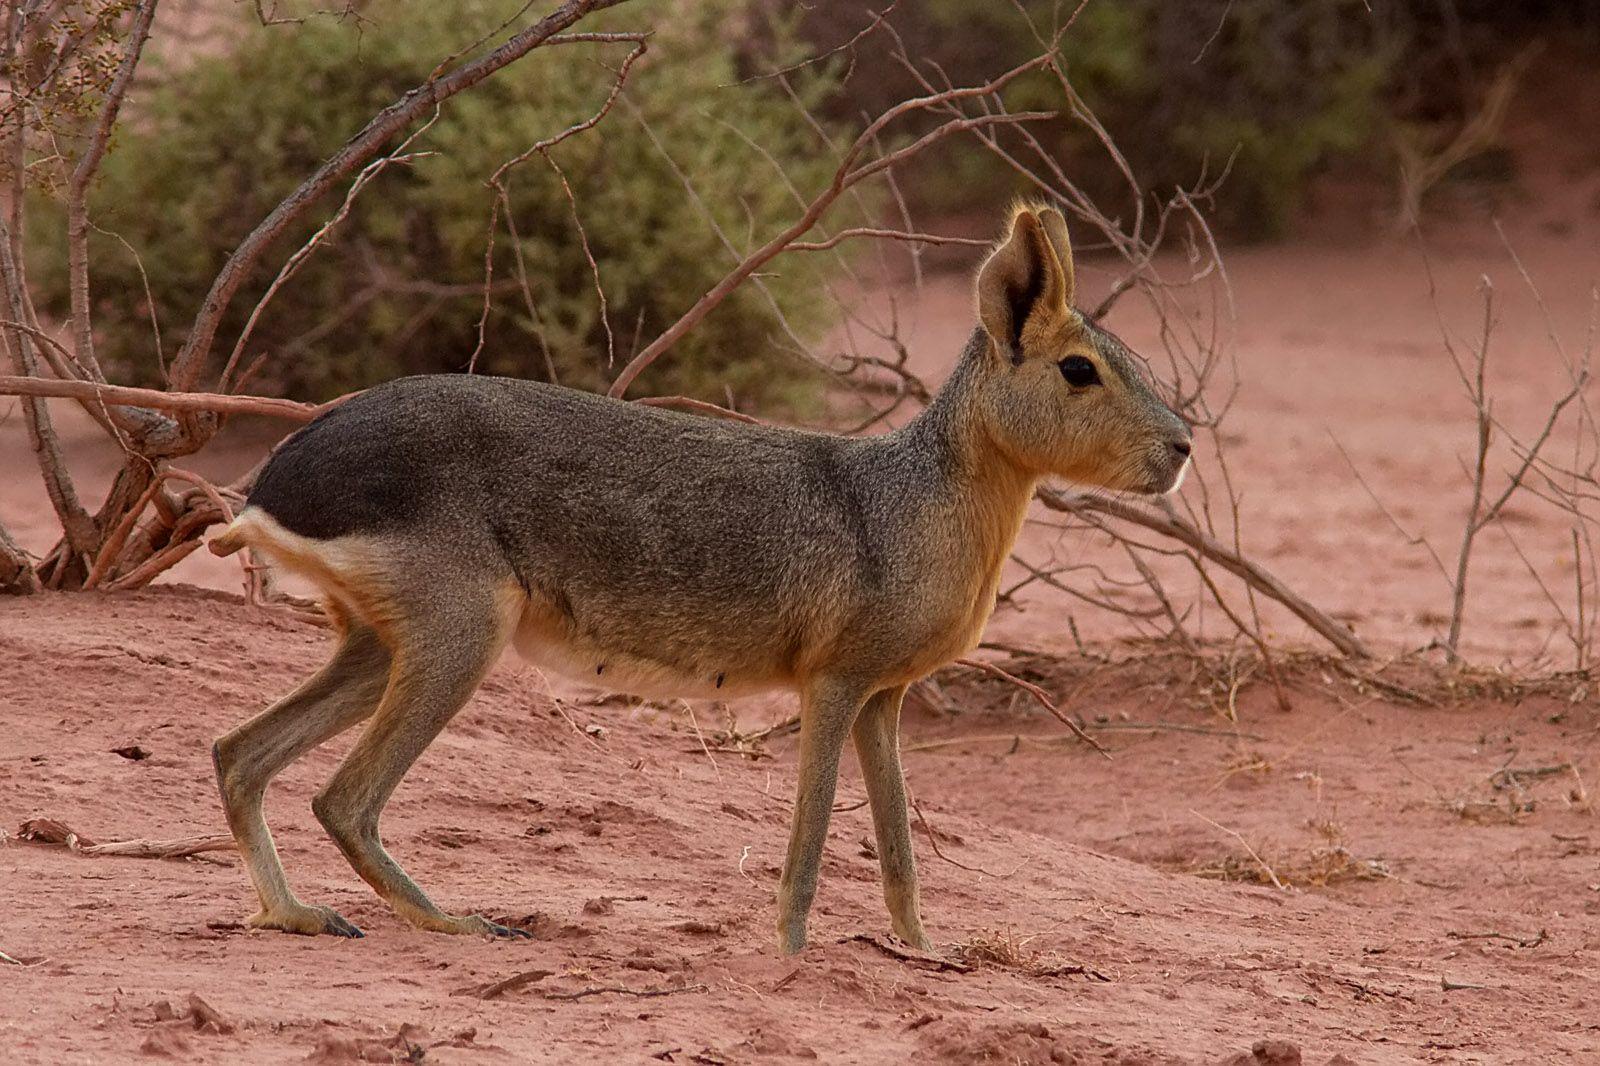 Rodent, Rabbit Lik Animal